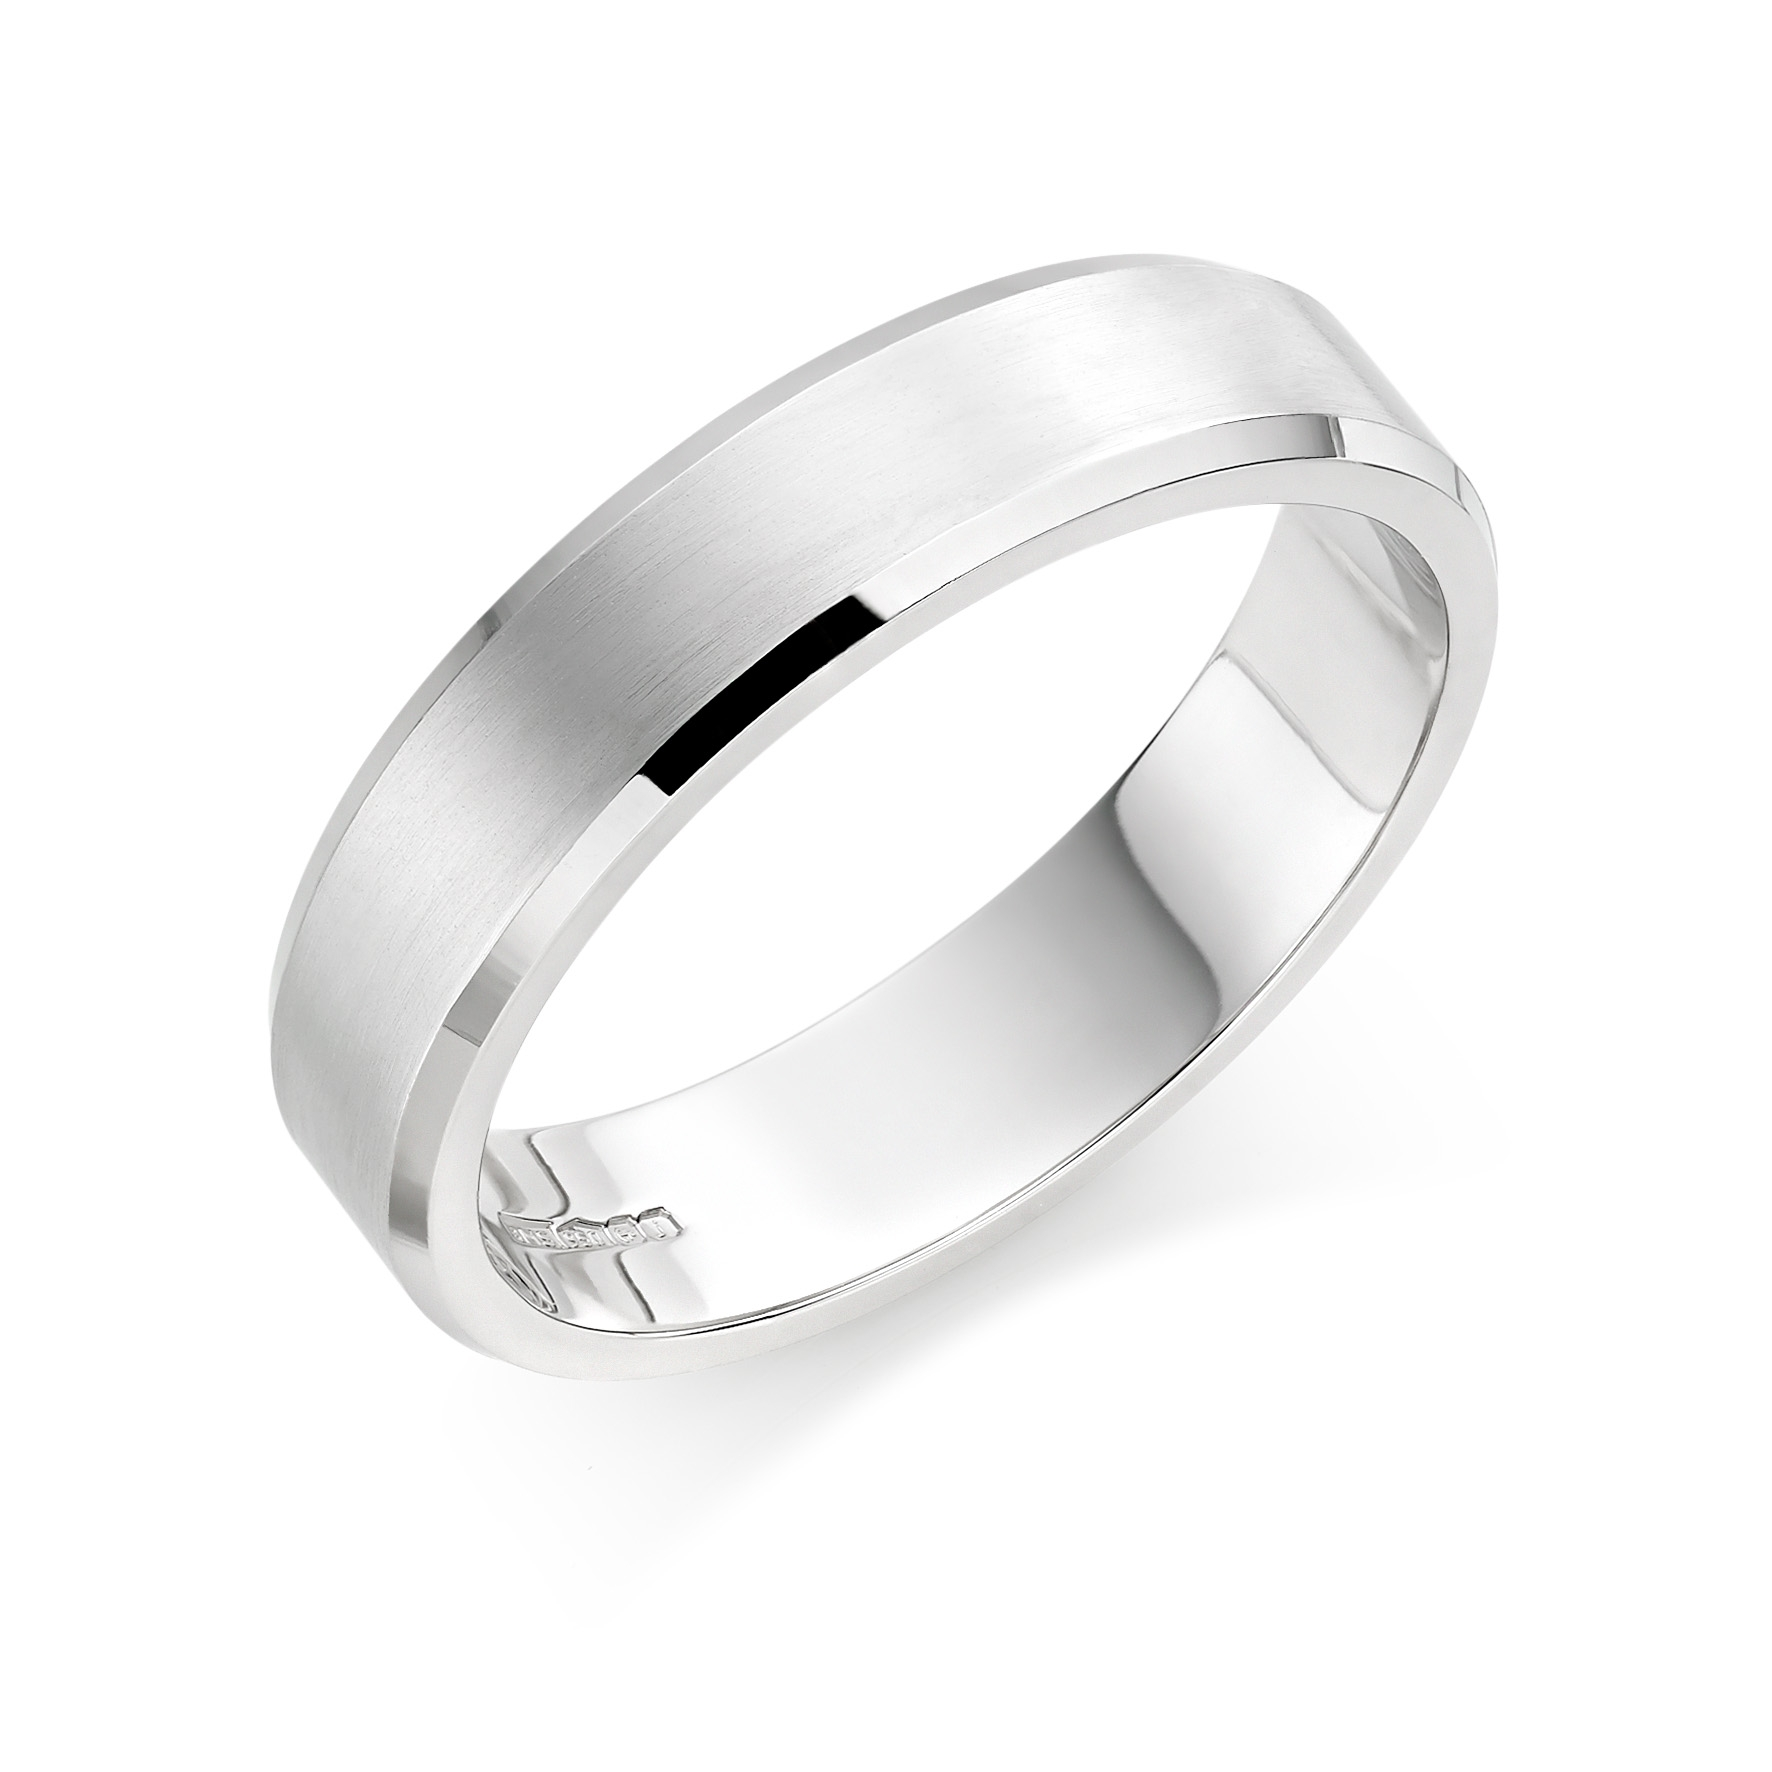 New Windsor Wedding Rings in Hatton Garden